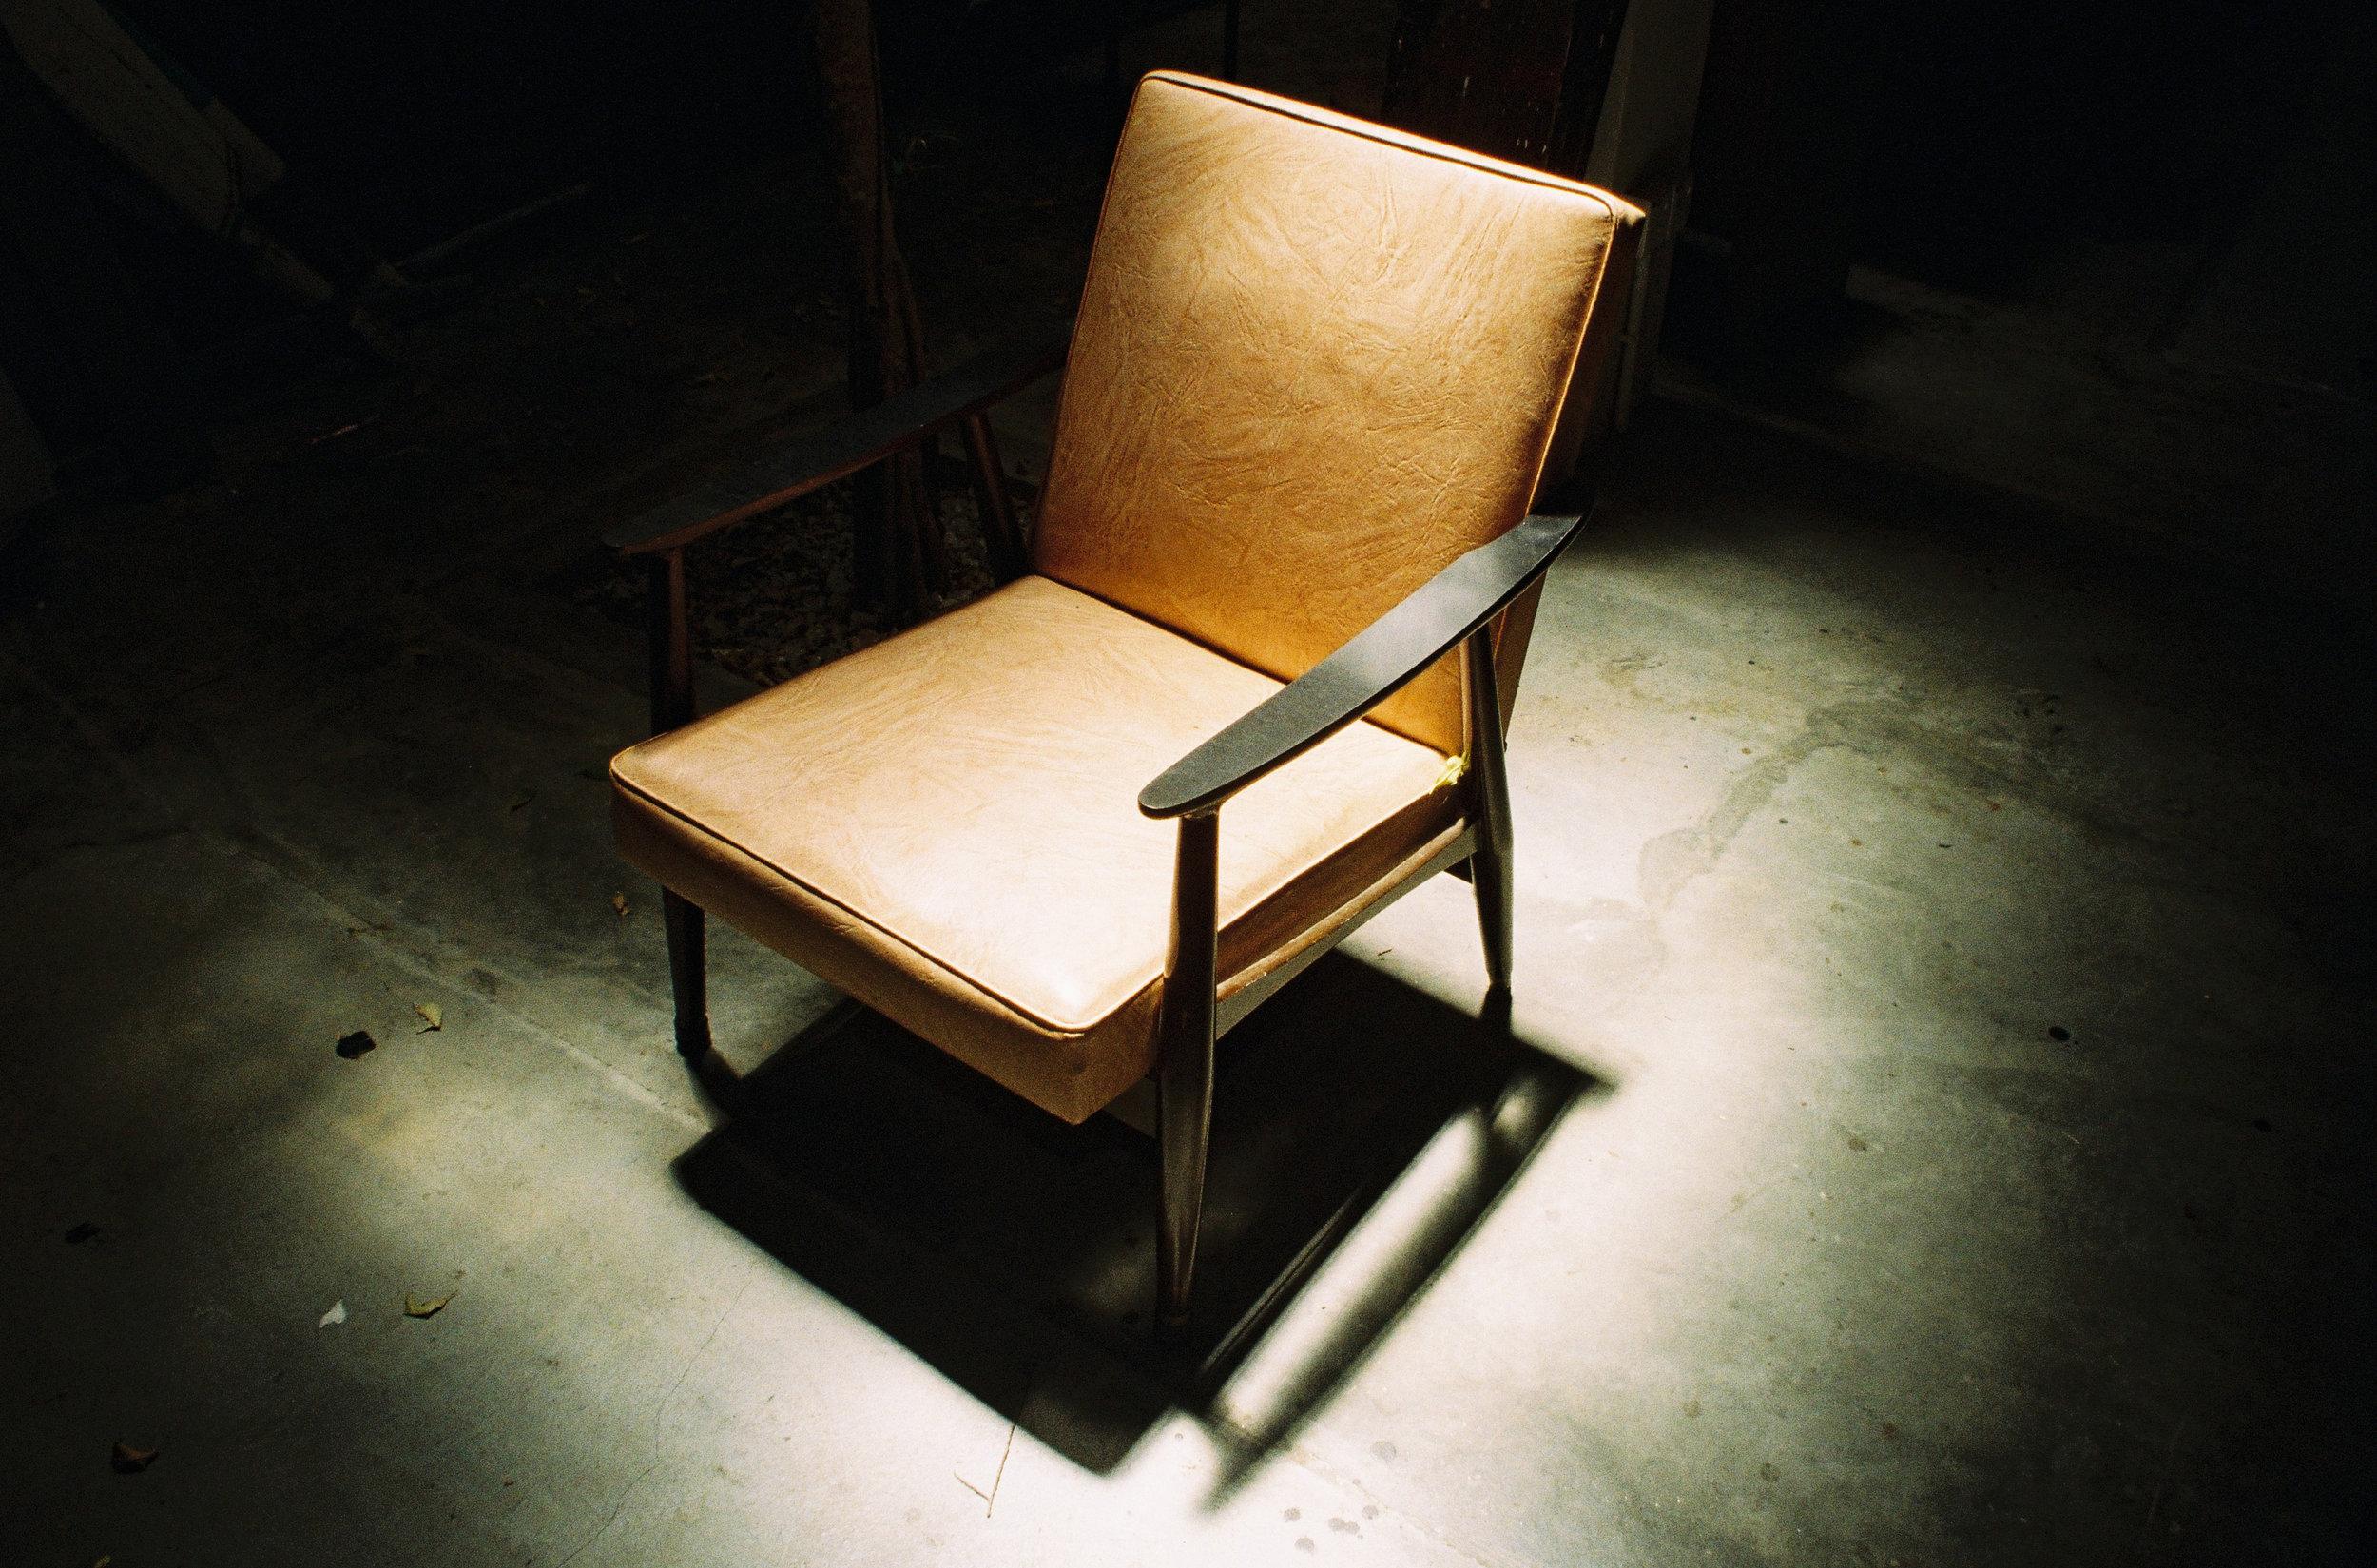 SILENCE IN SITTING ALONE